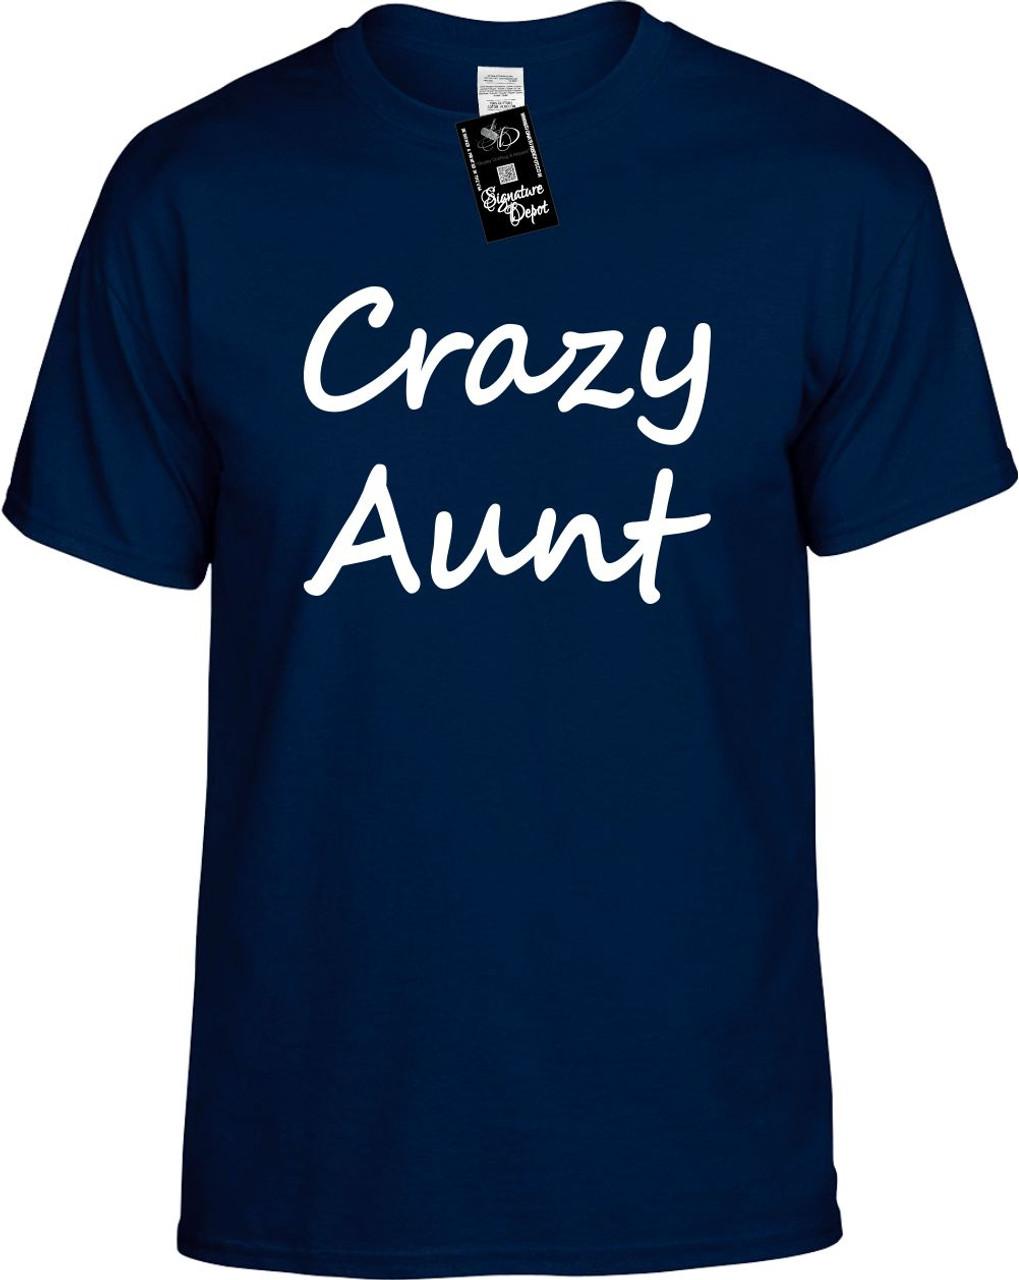 c61f8ea2638a Crazy Aunt Youth Novelty T-Shirt